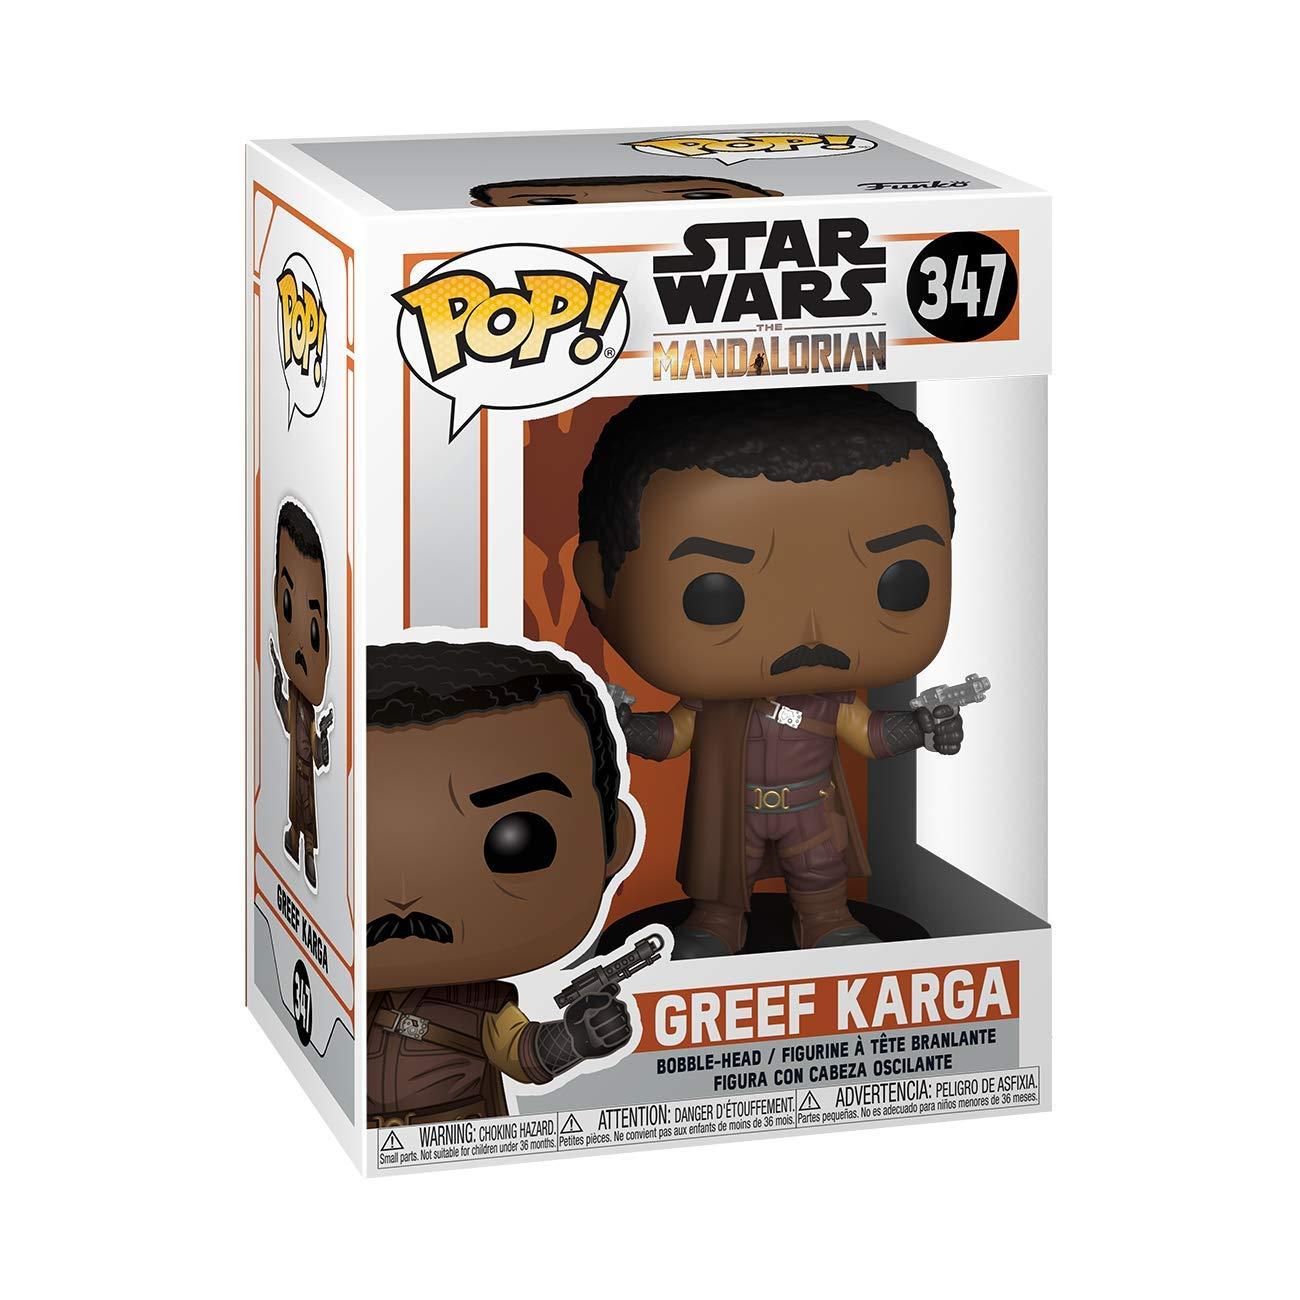 Funko Star Wars: The Mandalorian - Greef Karga